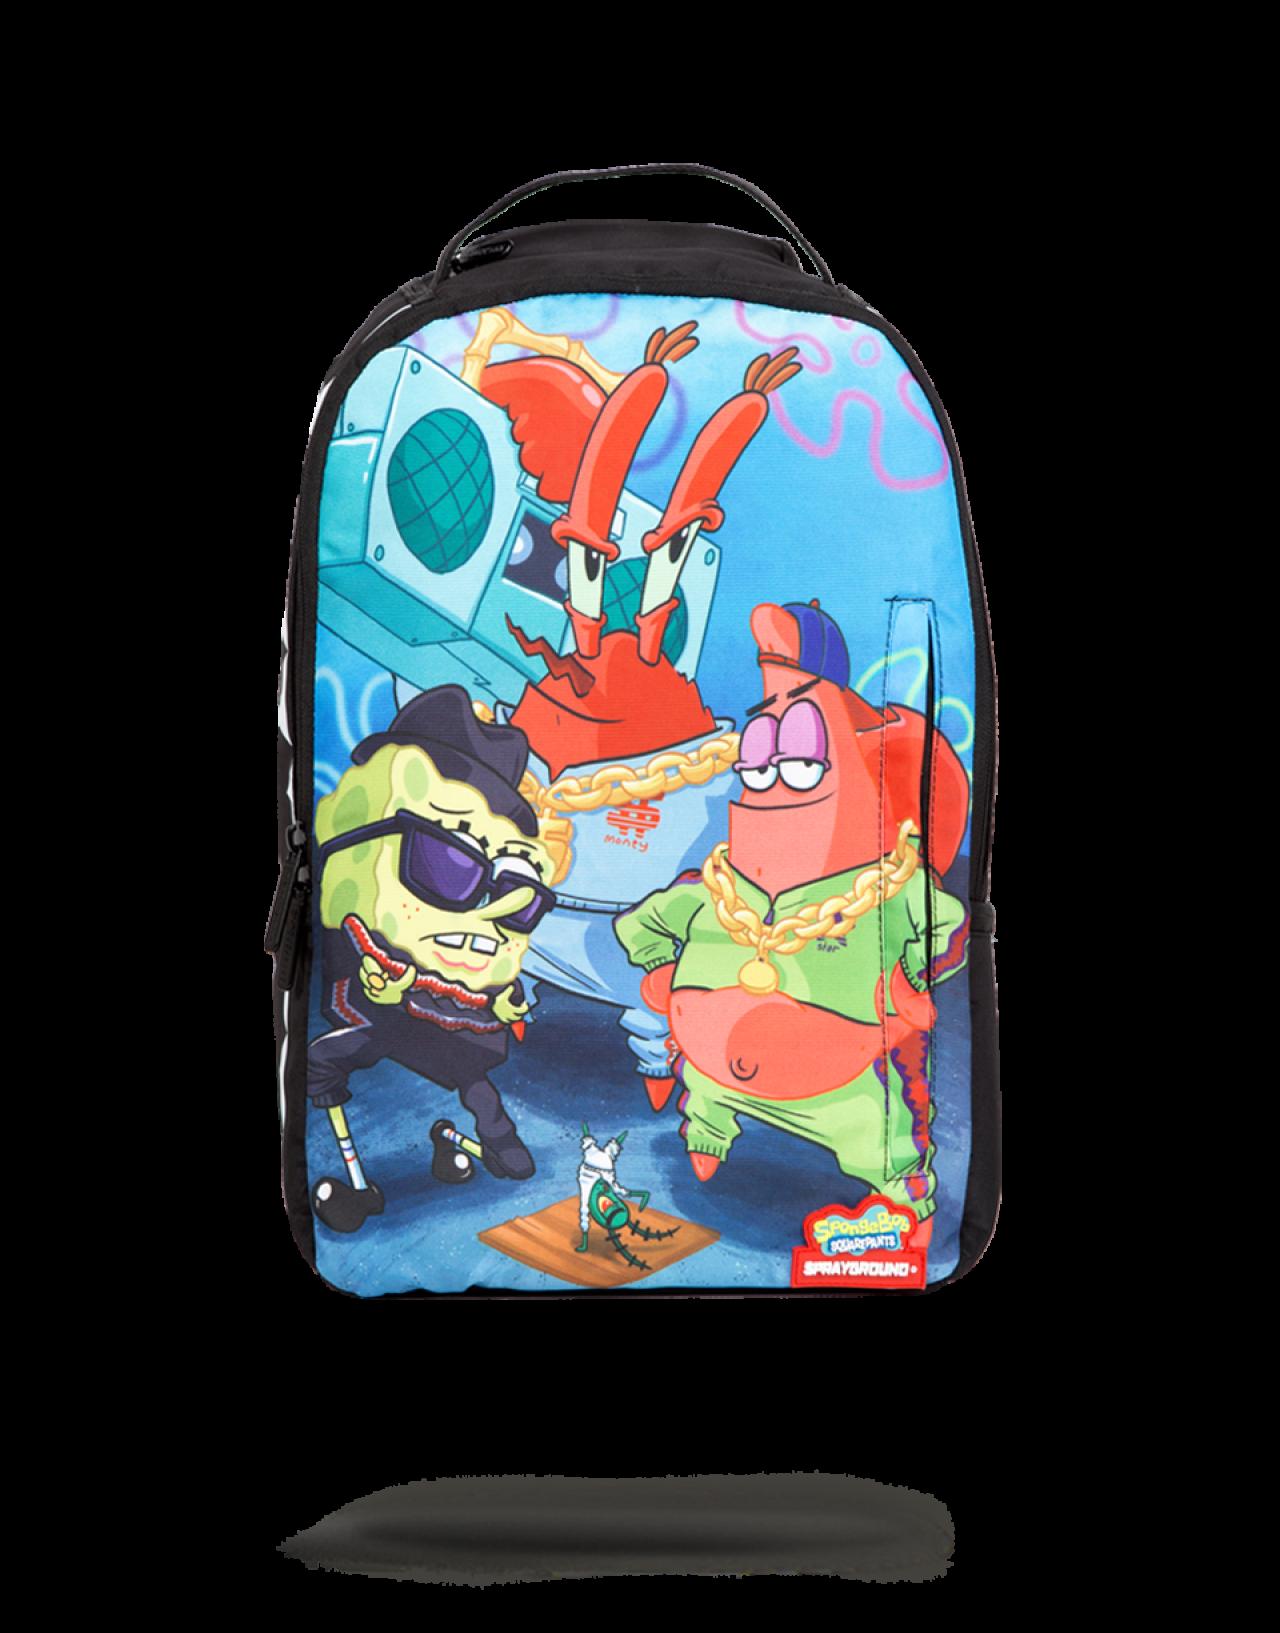 b6085ea2a87 Sprayground Spongebob Pant Boyz | Geek | Spongebob pants, Boys ...